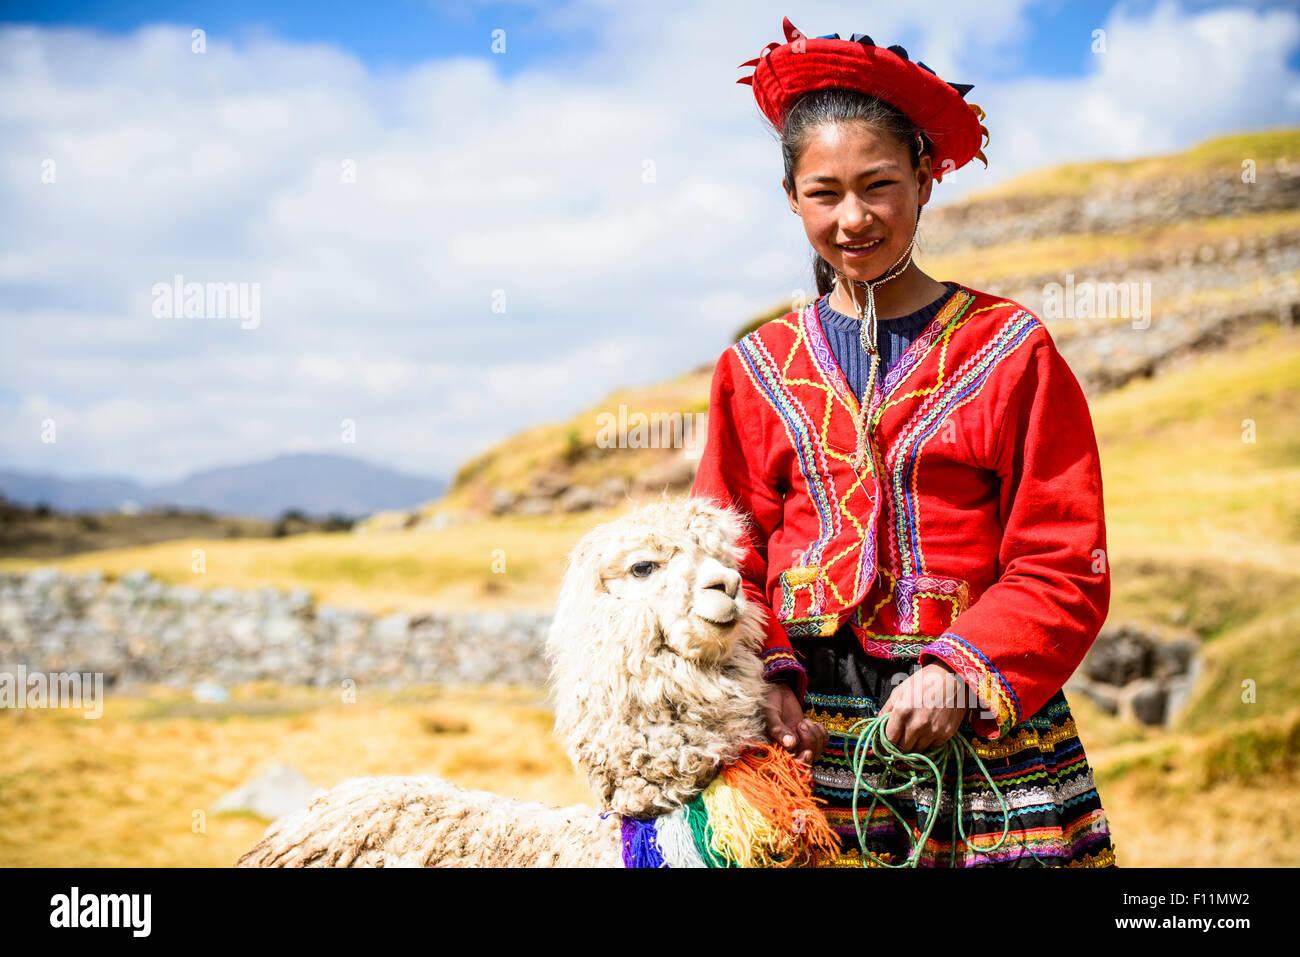 Chica hispana caminar llama en paisaje rural Imagen De Stock